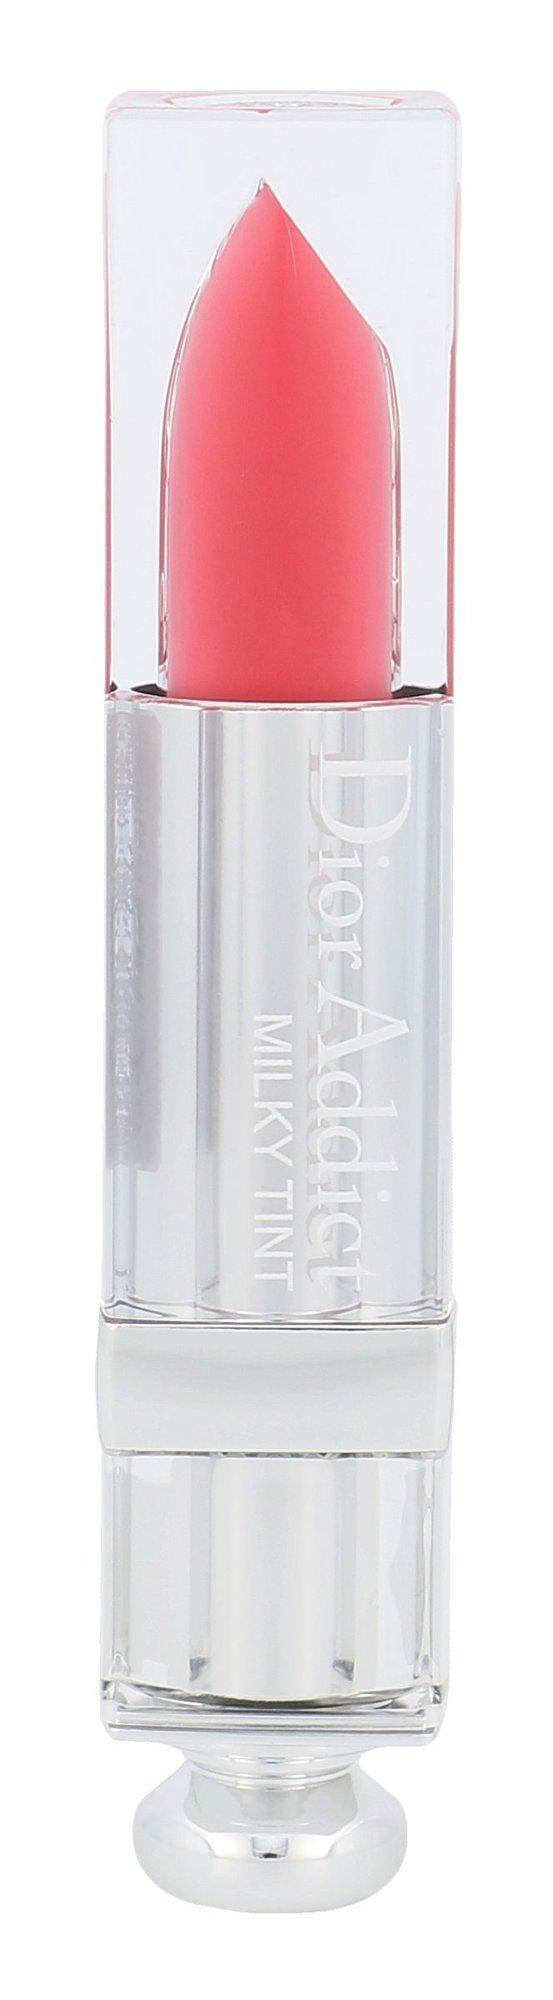 Christian Dior Addict Cosmetic 5,5ml 376 Milky Pop Milky Tint